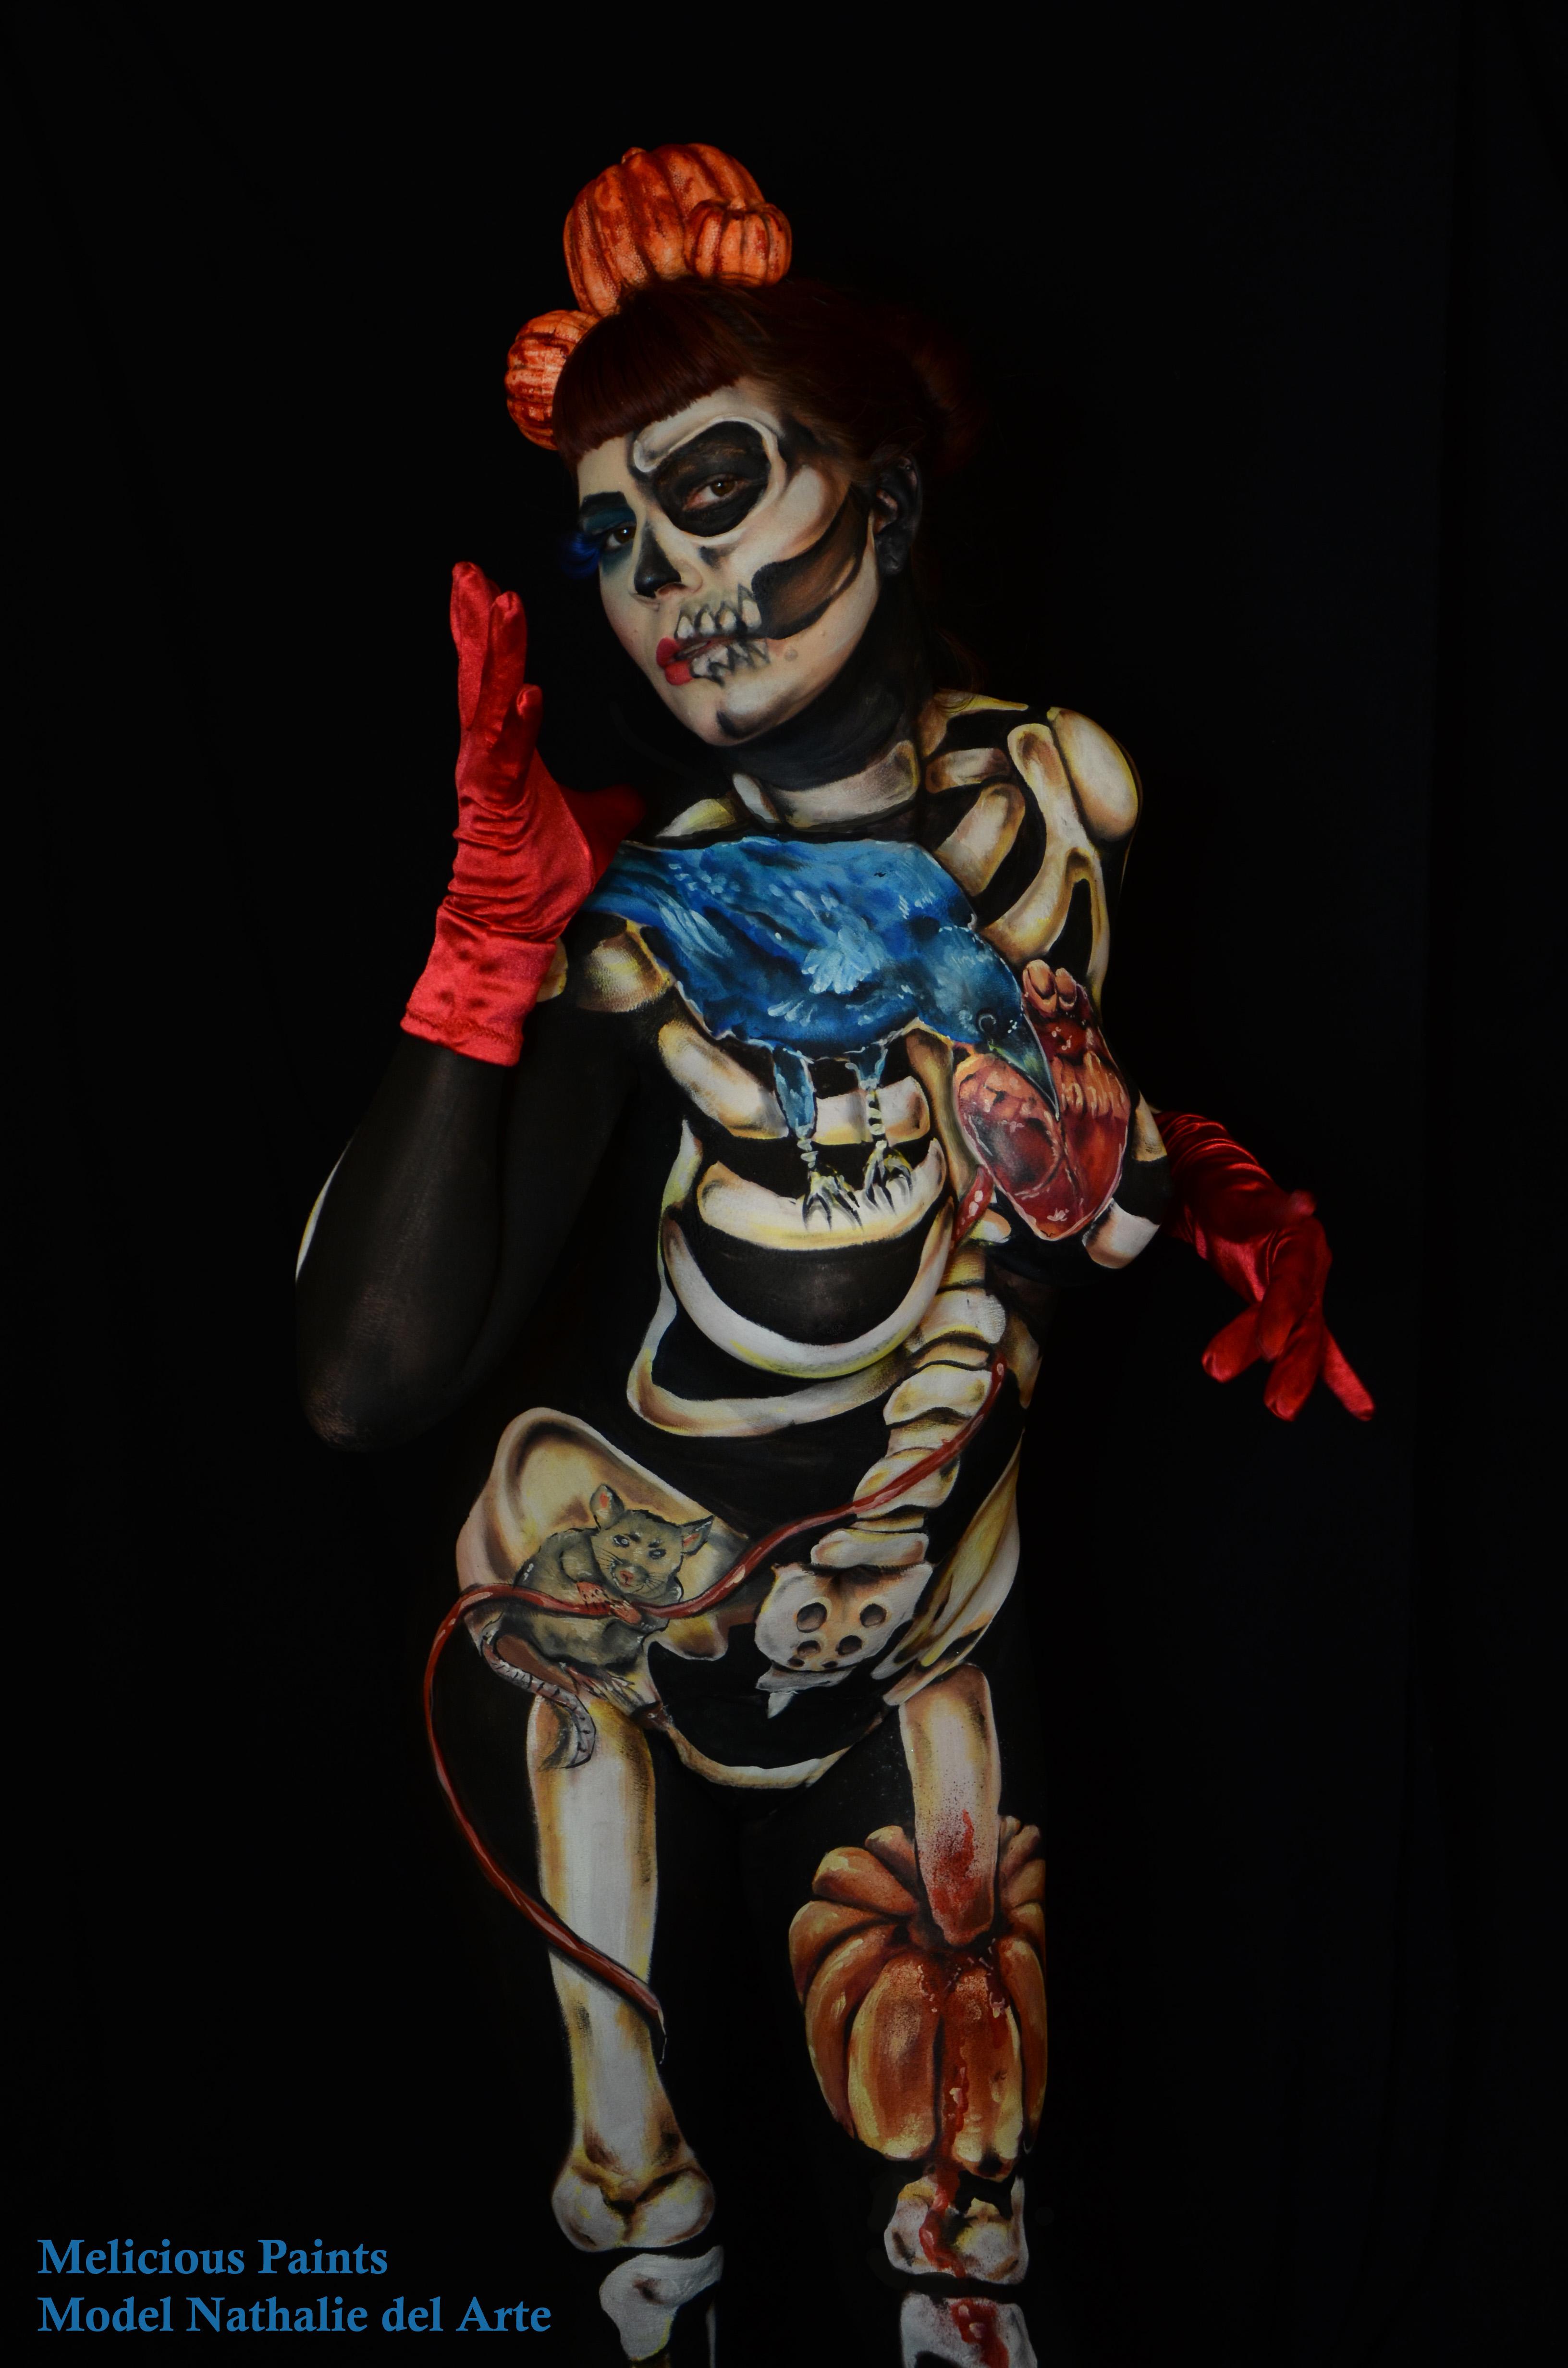 bodypaint Halloween crow heart mouse skill skeleton pumpkin